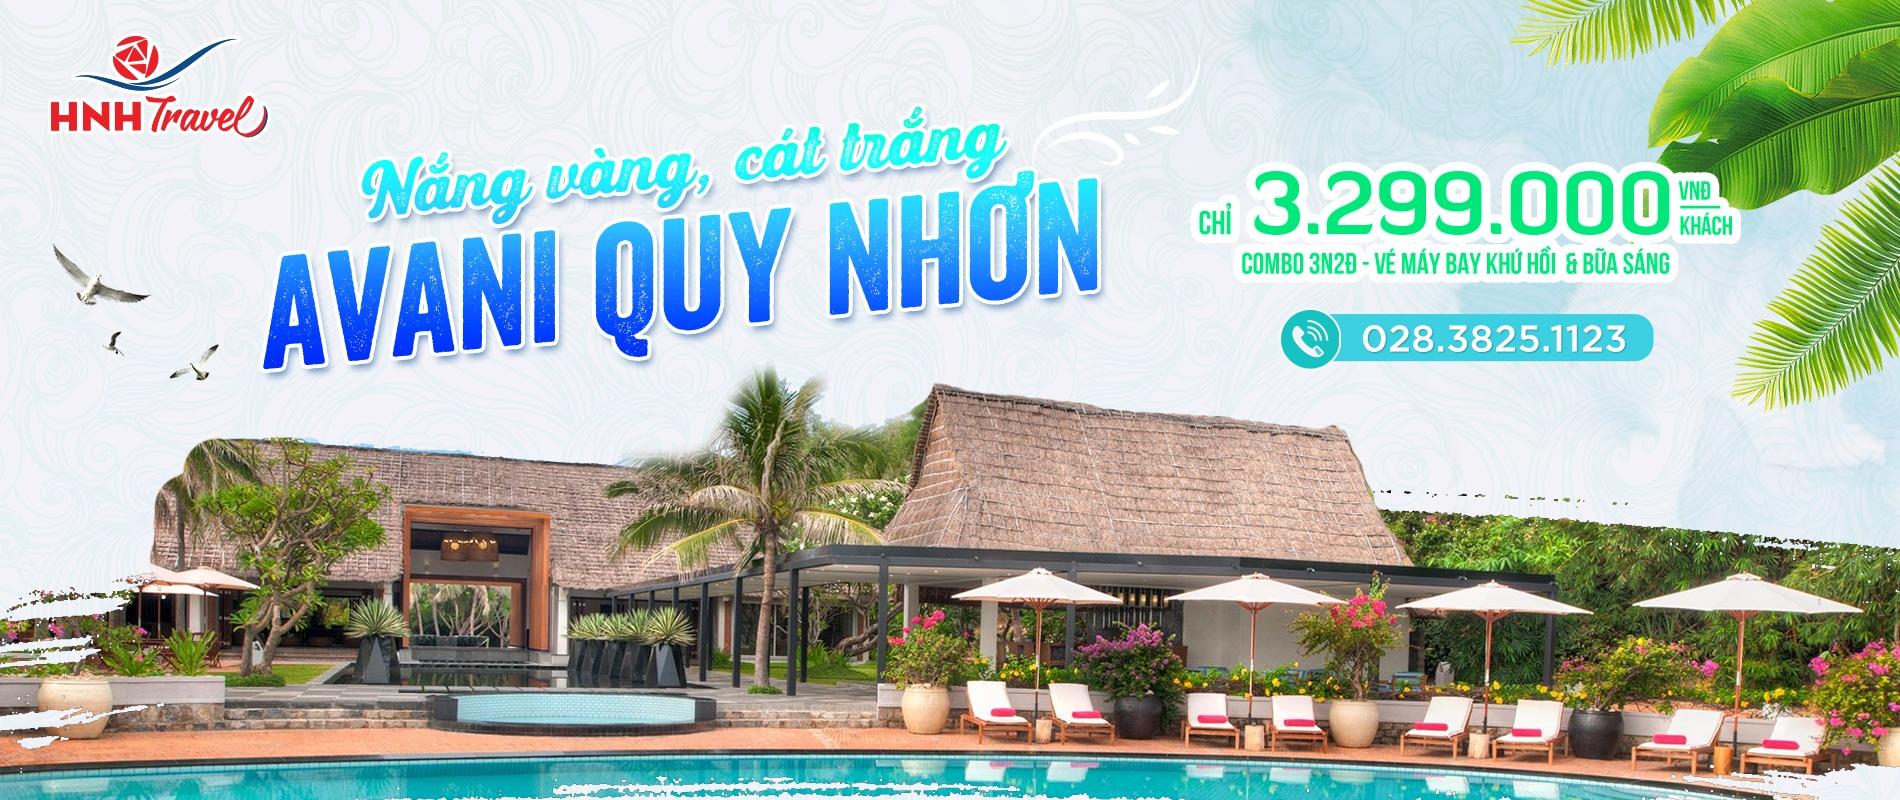 Avani Quy Nhon